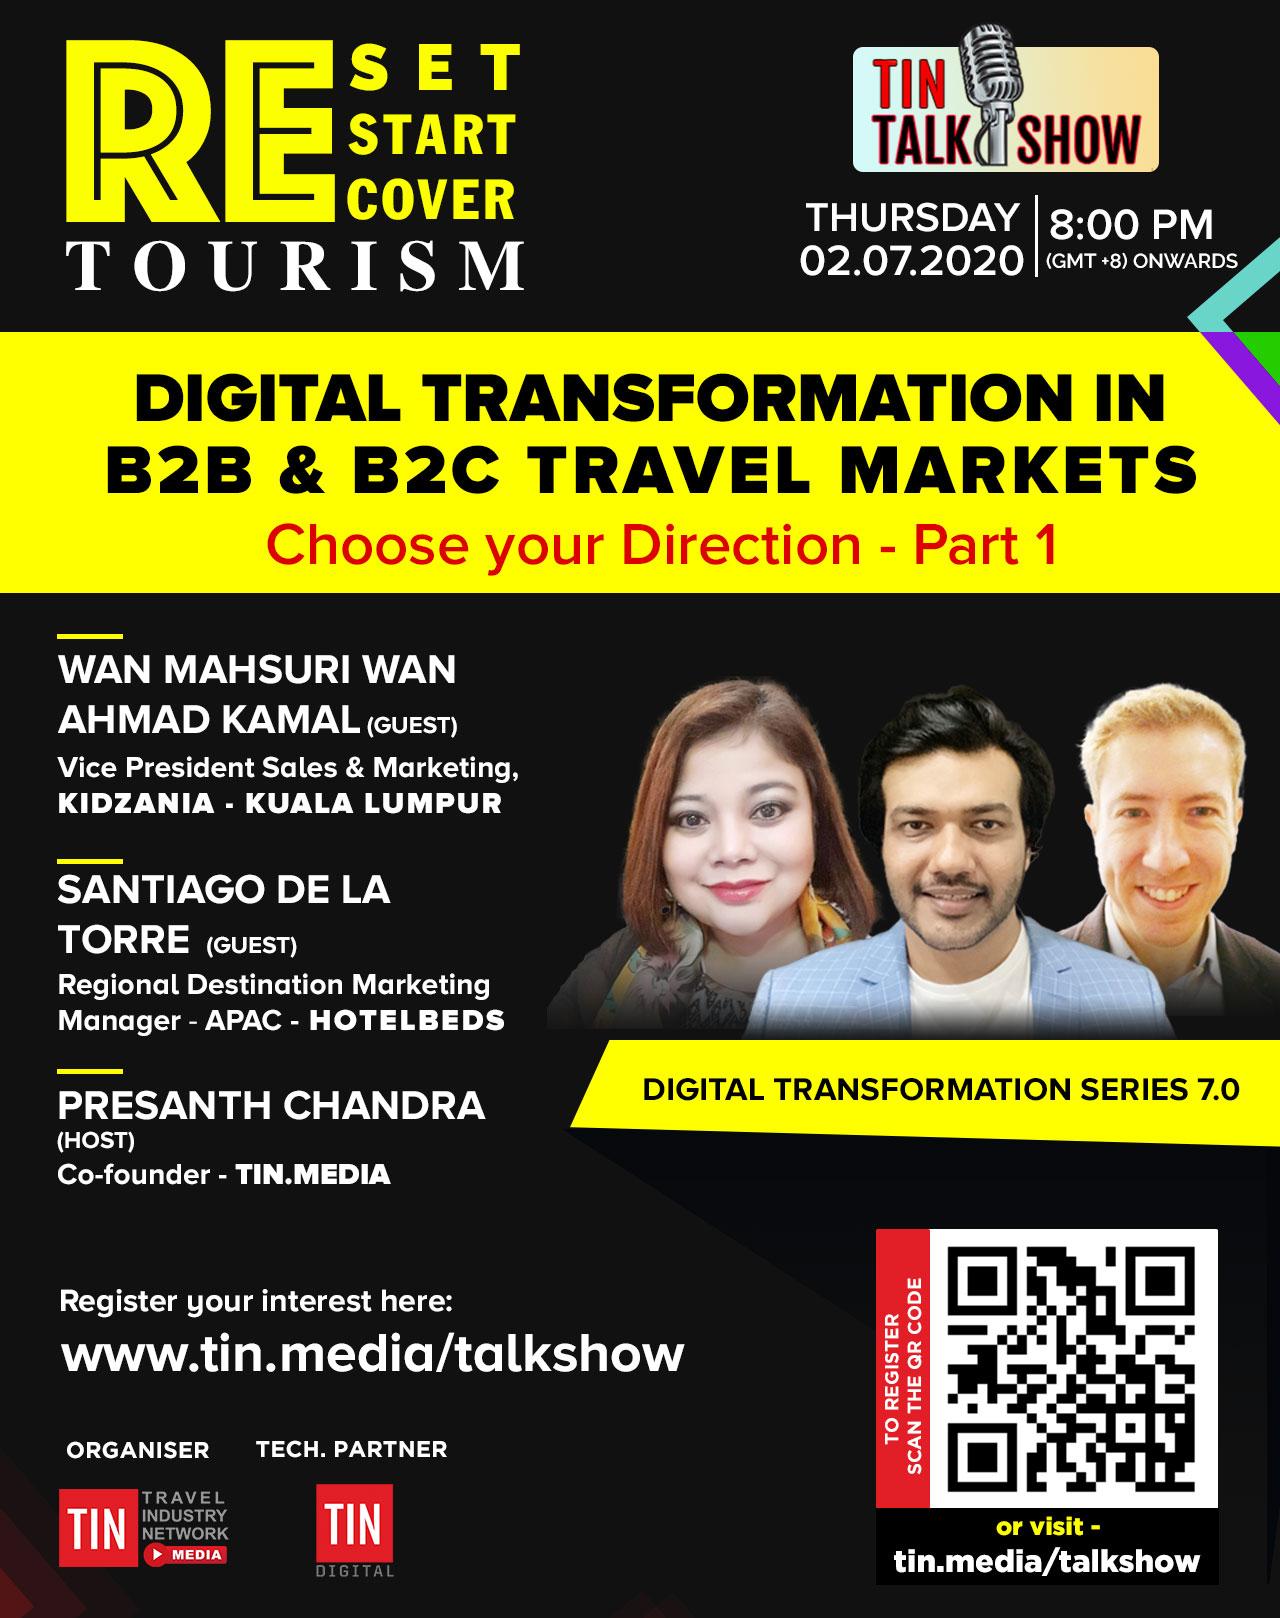 digital transformation series 5.0